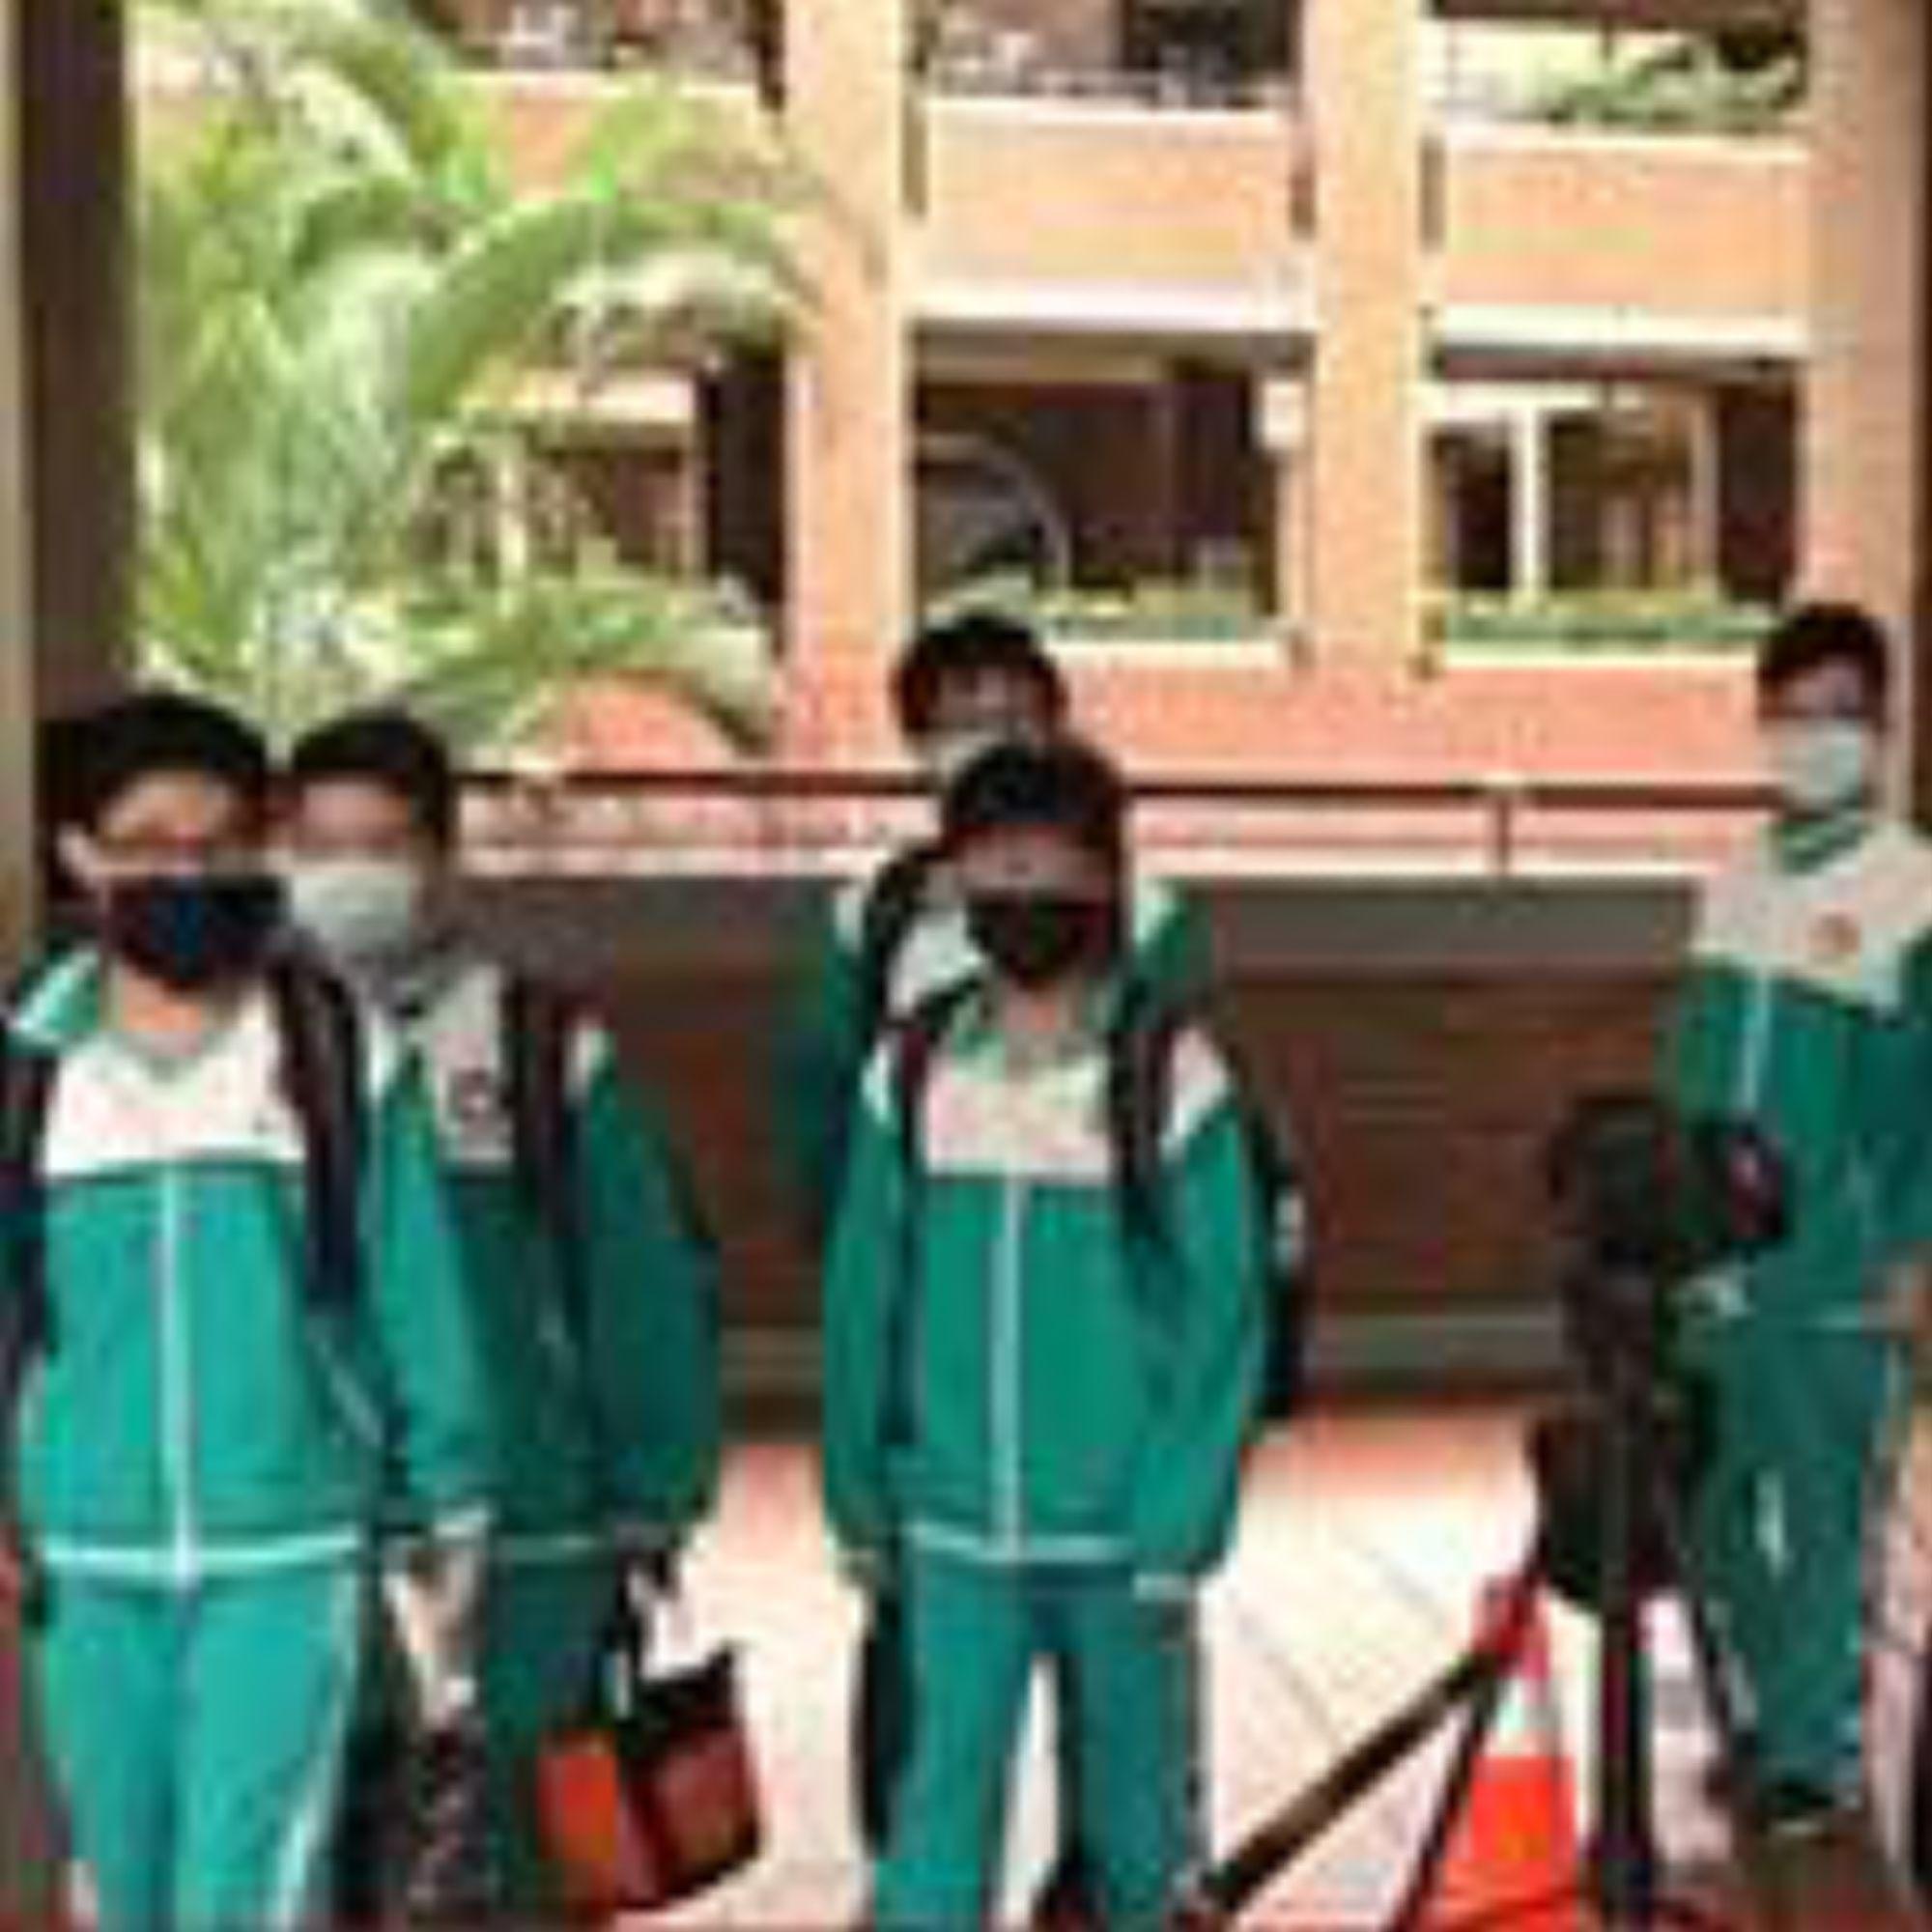 <h3>应用现场直击 | 台湾新北市某中学校园体表温度筛查</h3>